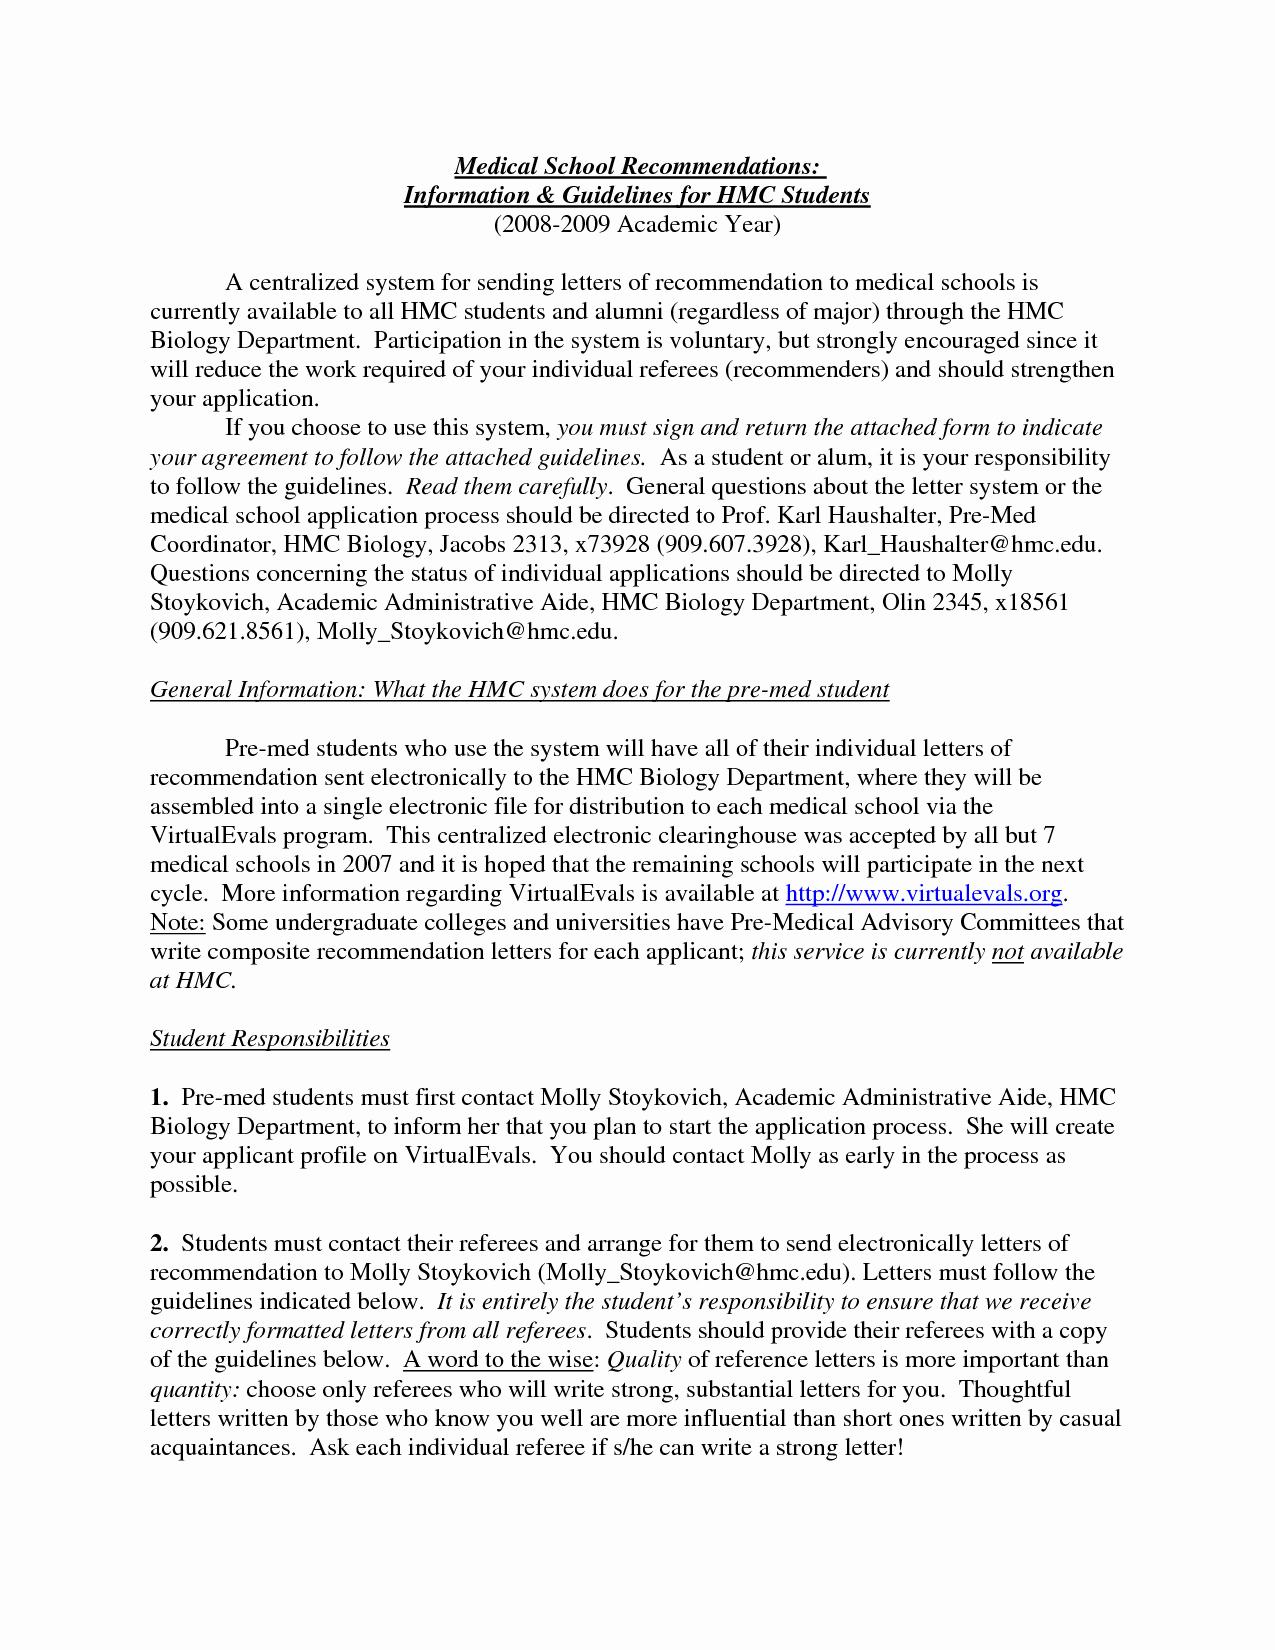 Medical School Recommendation Letter Example Awesome Re Mendation format Portablegasgrillweber